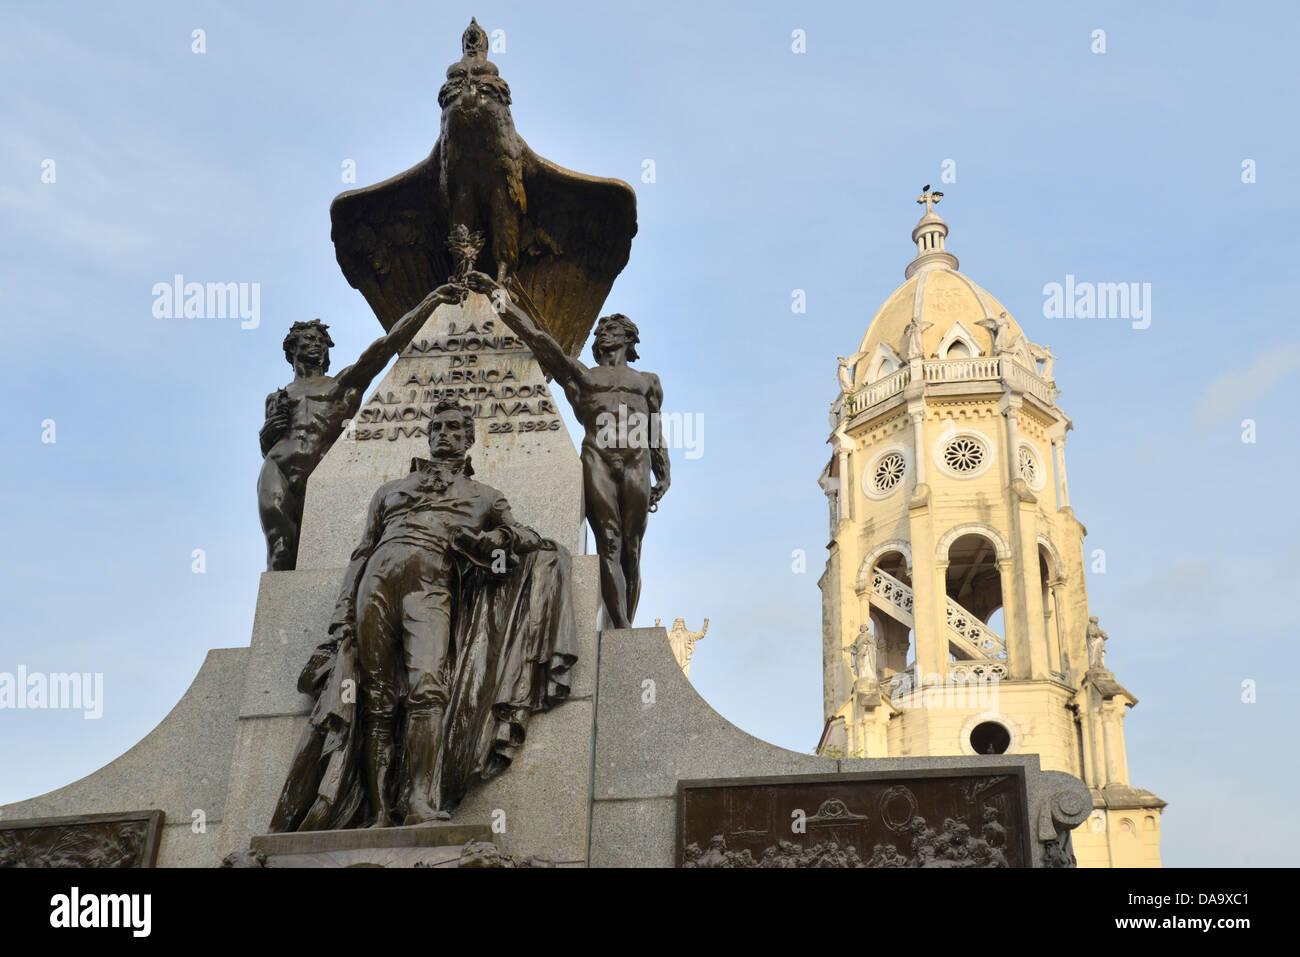 Mittelamerika, Panama Stadt, Casco Viejo, Altstadt, Denkmal, Bolivar, Kirche, Panama Stockbild